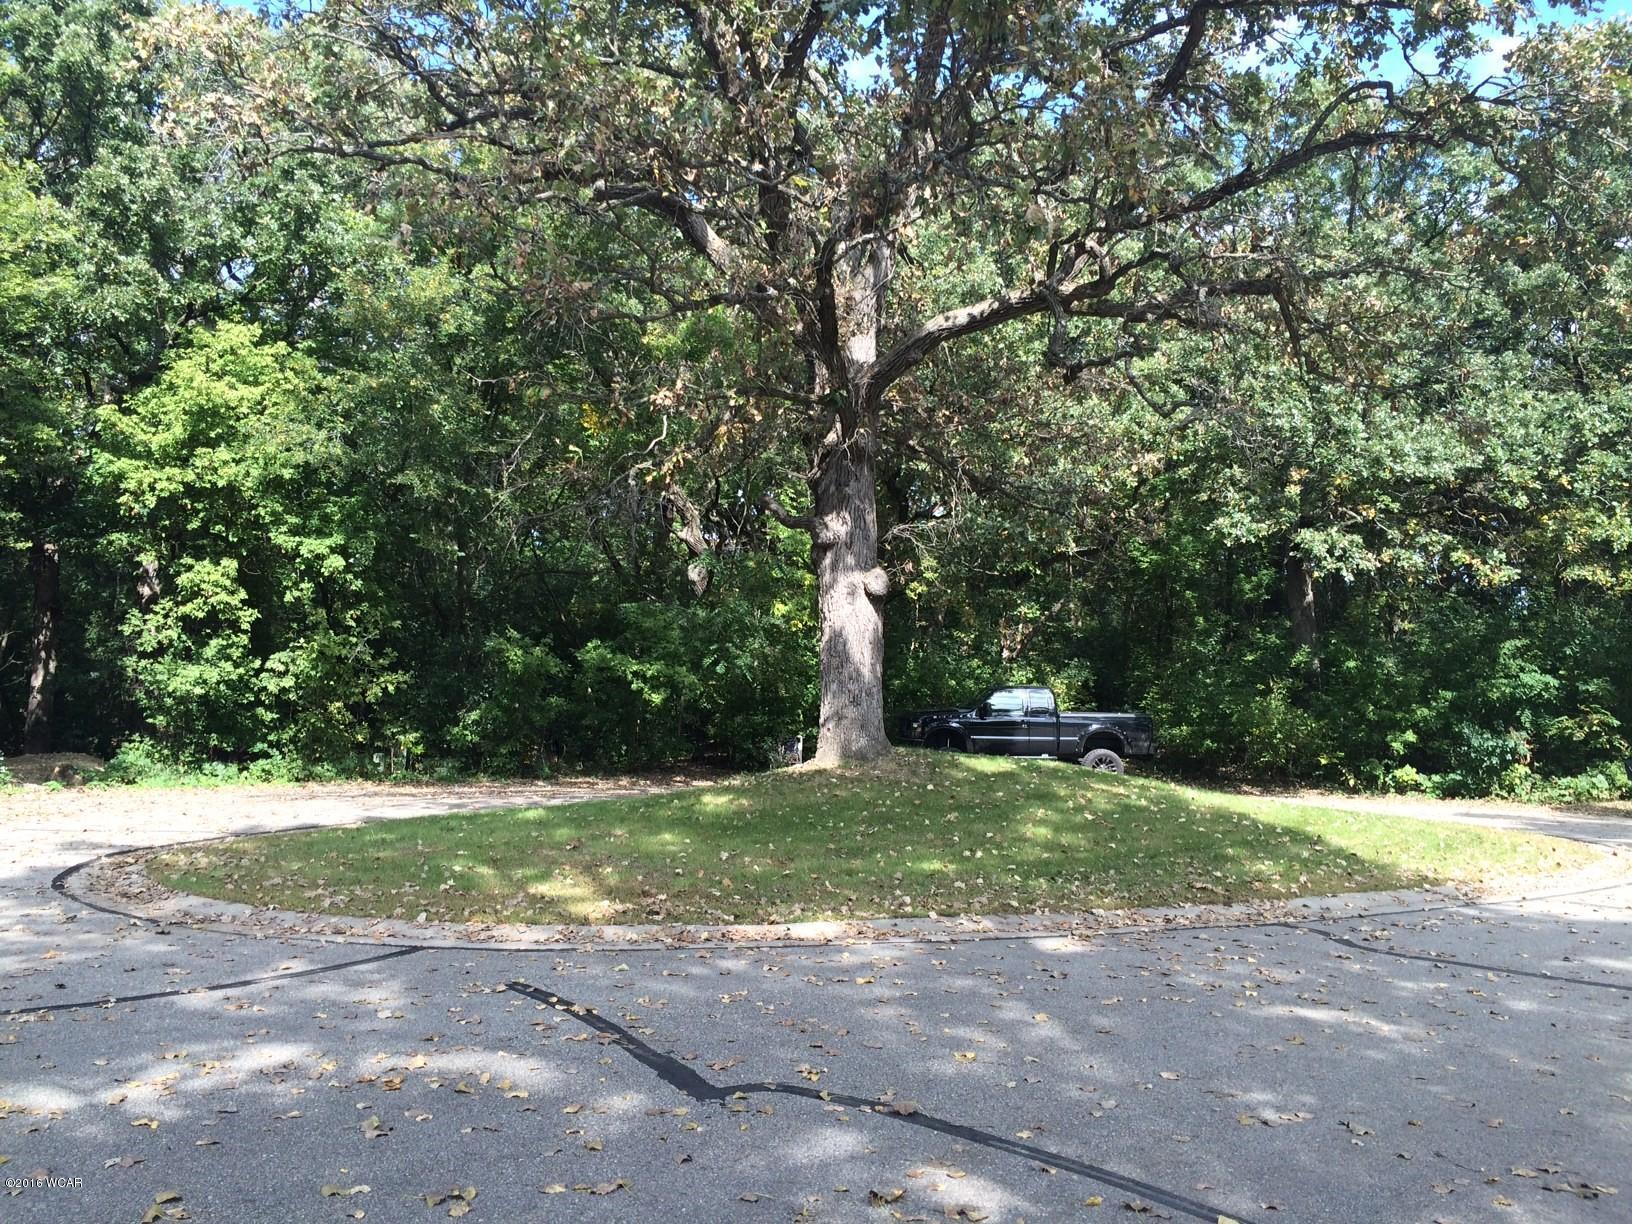 Lot 7 NE 29th St - Hidden Oaks,Willmar,Residential Land,NE 29th St - Hidden Oaks,6005814